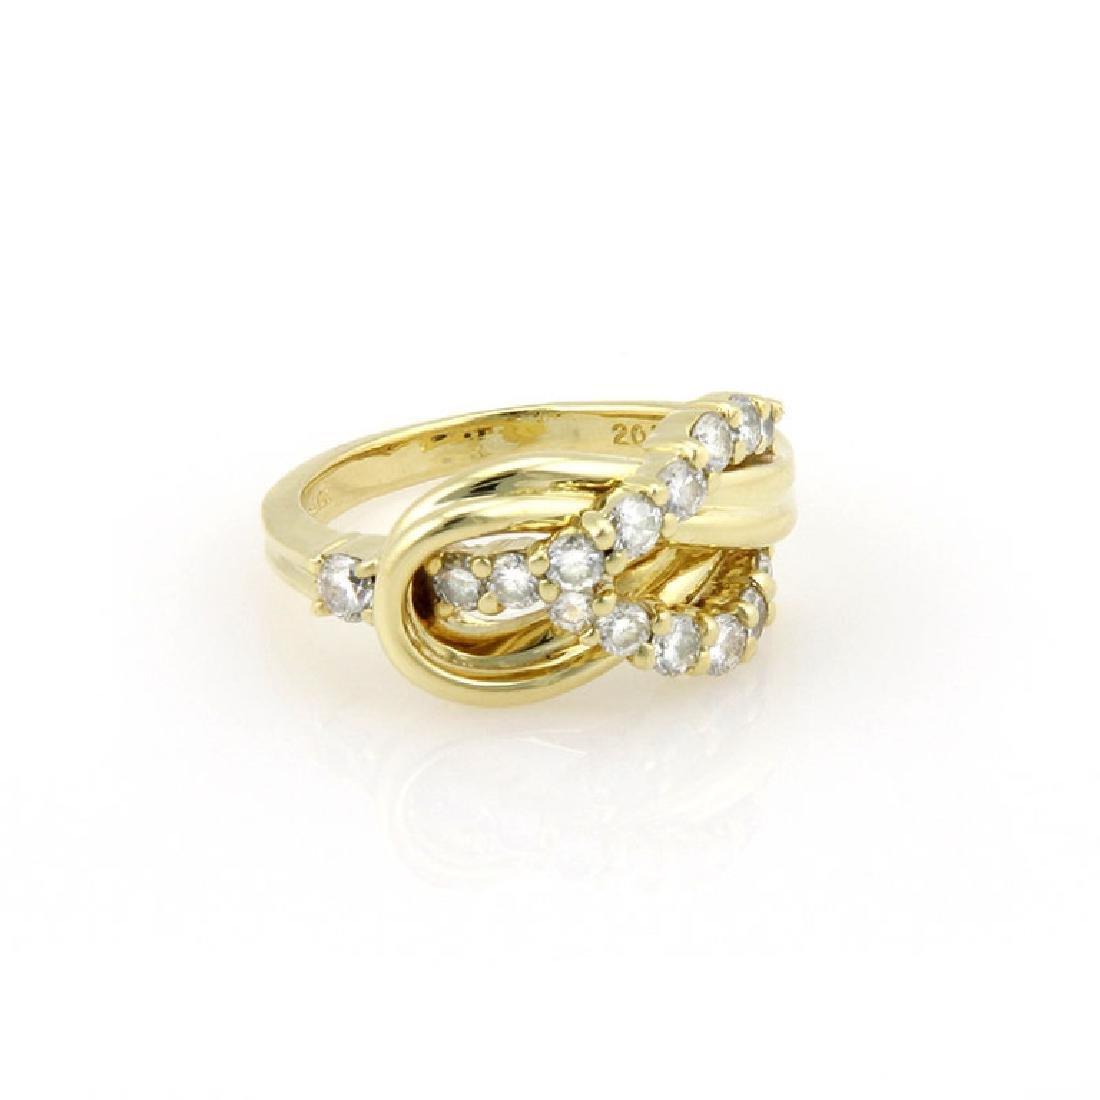 Jose Hess 18K Gold Diamond Knot Designer Ring